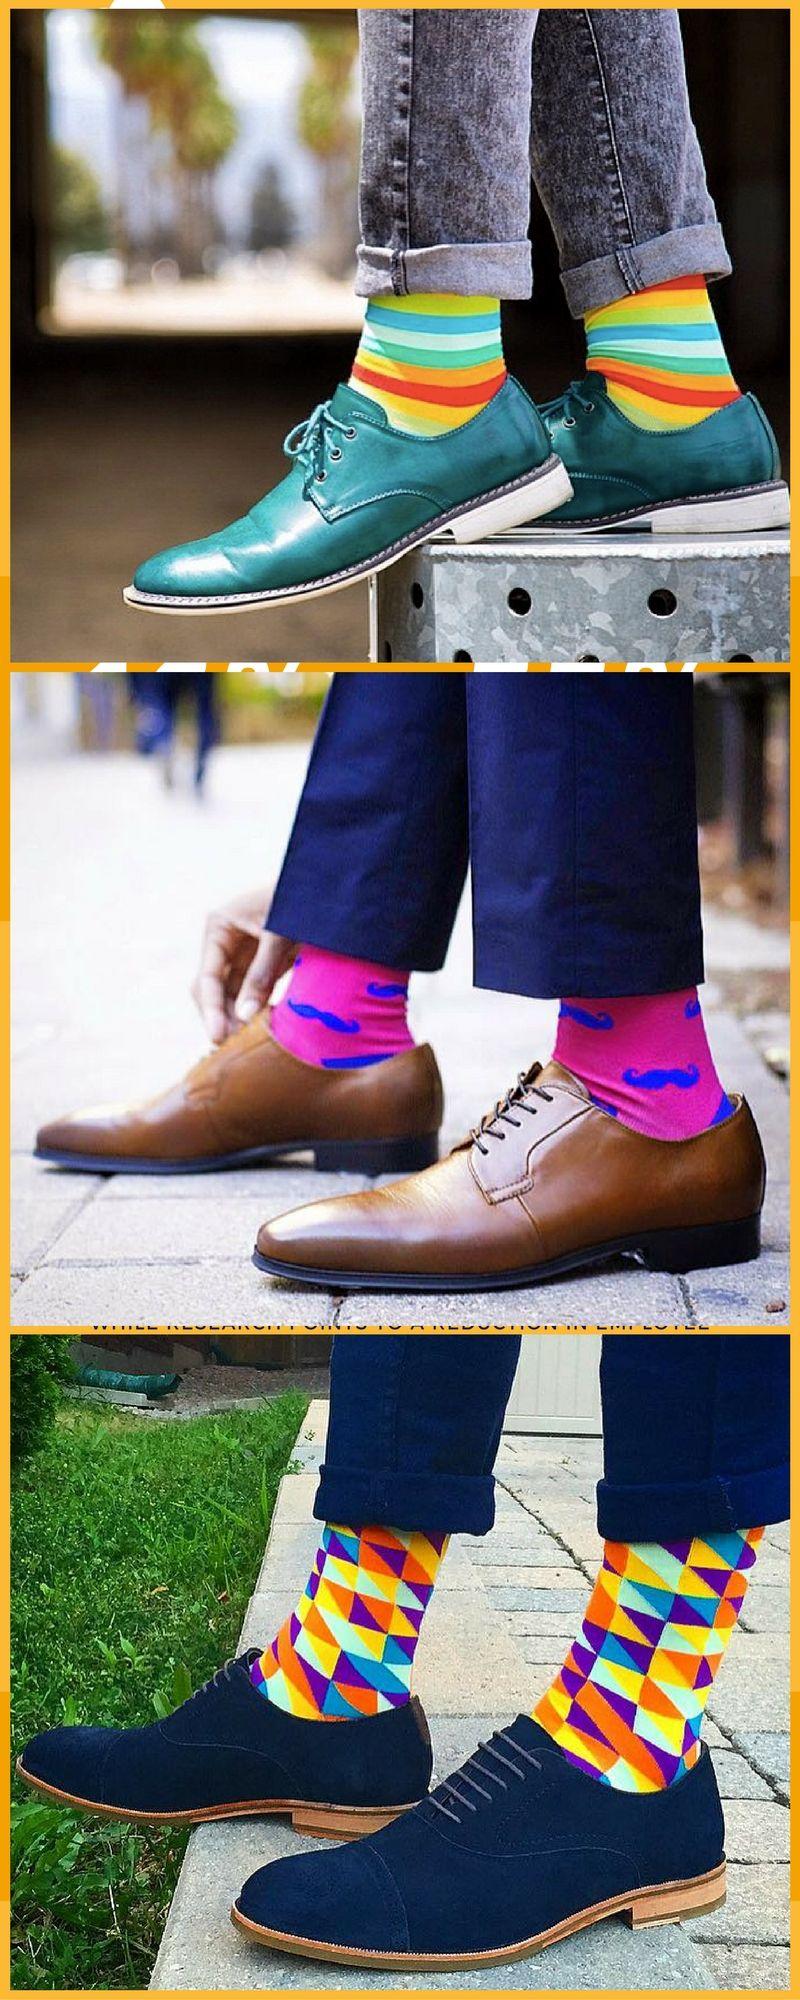 ililily Mens 10 Pairs Solid Color Shoe Hidden Footies No Show Socks